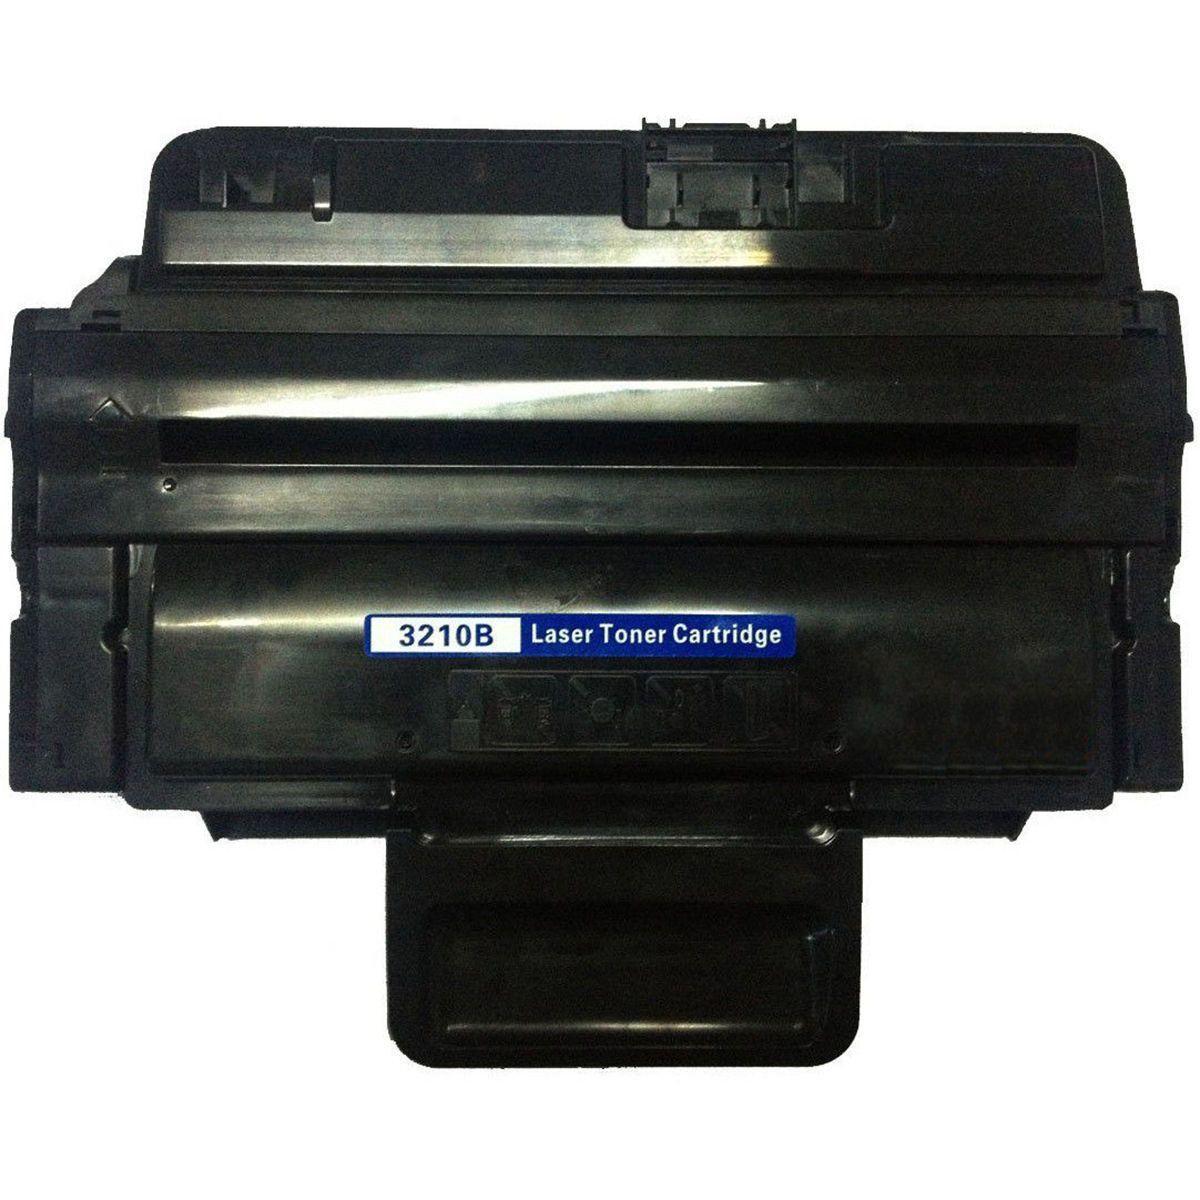 Compatível: Toner para Impressora Xerox WorkCentre 3210 3210n 3220 3220dn WC3210 WC3210n WC3220dn / Preto / 4.100